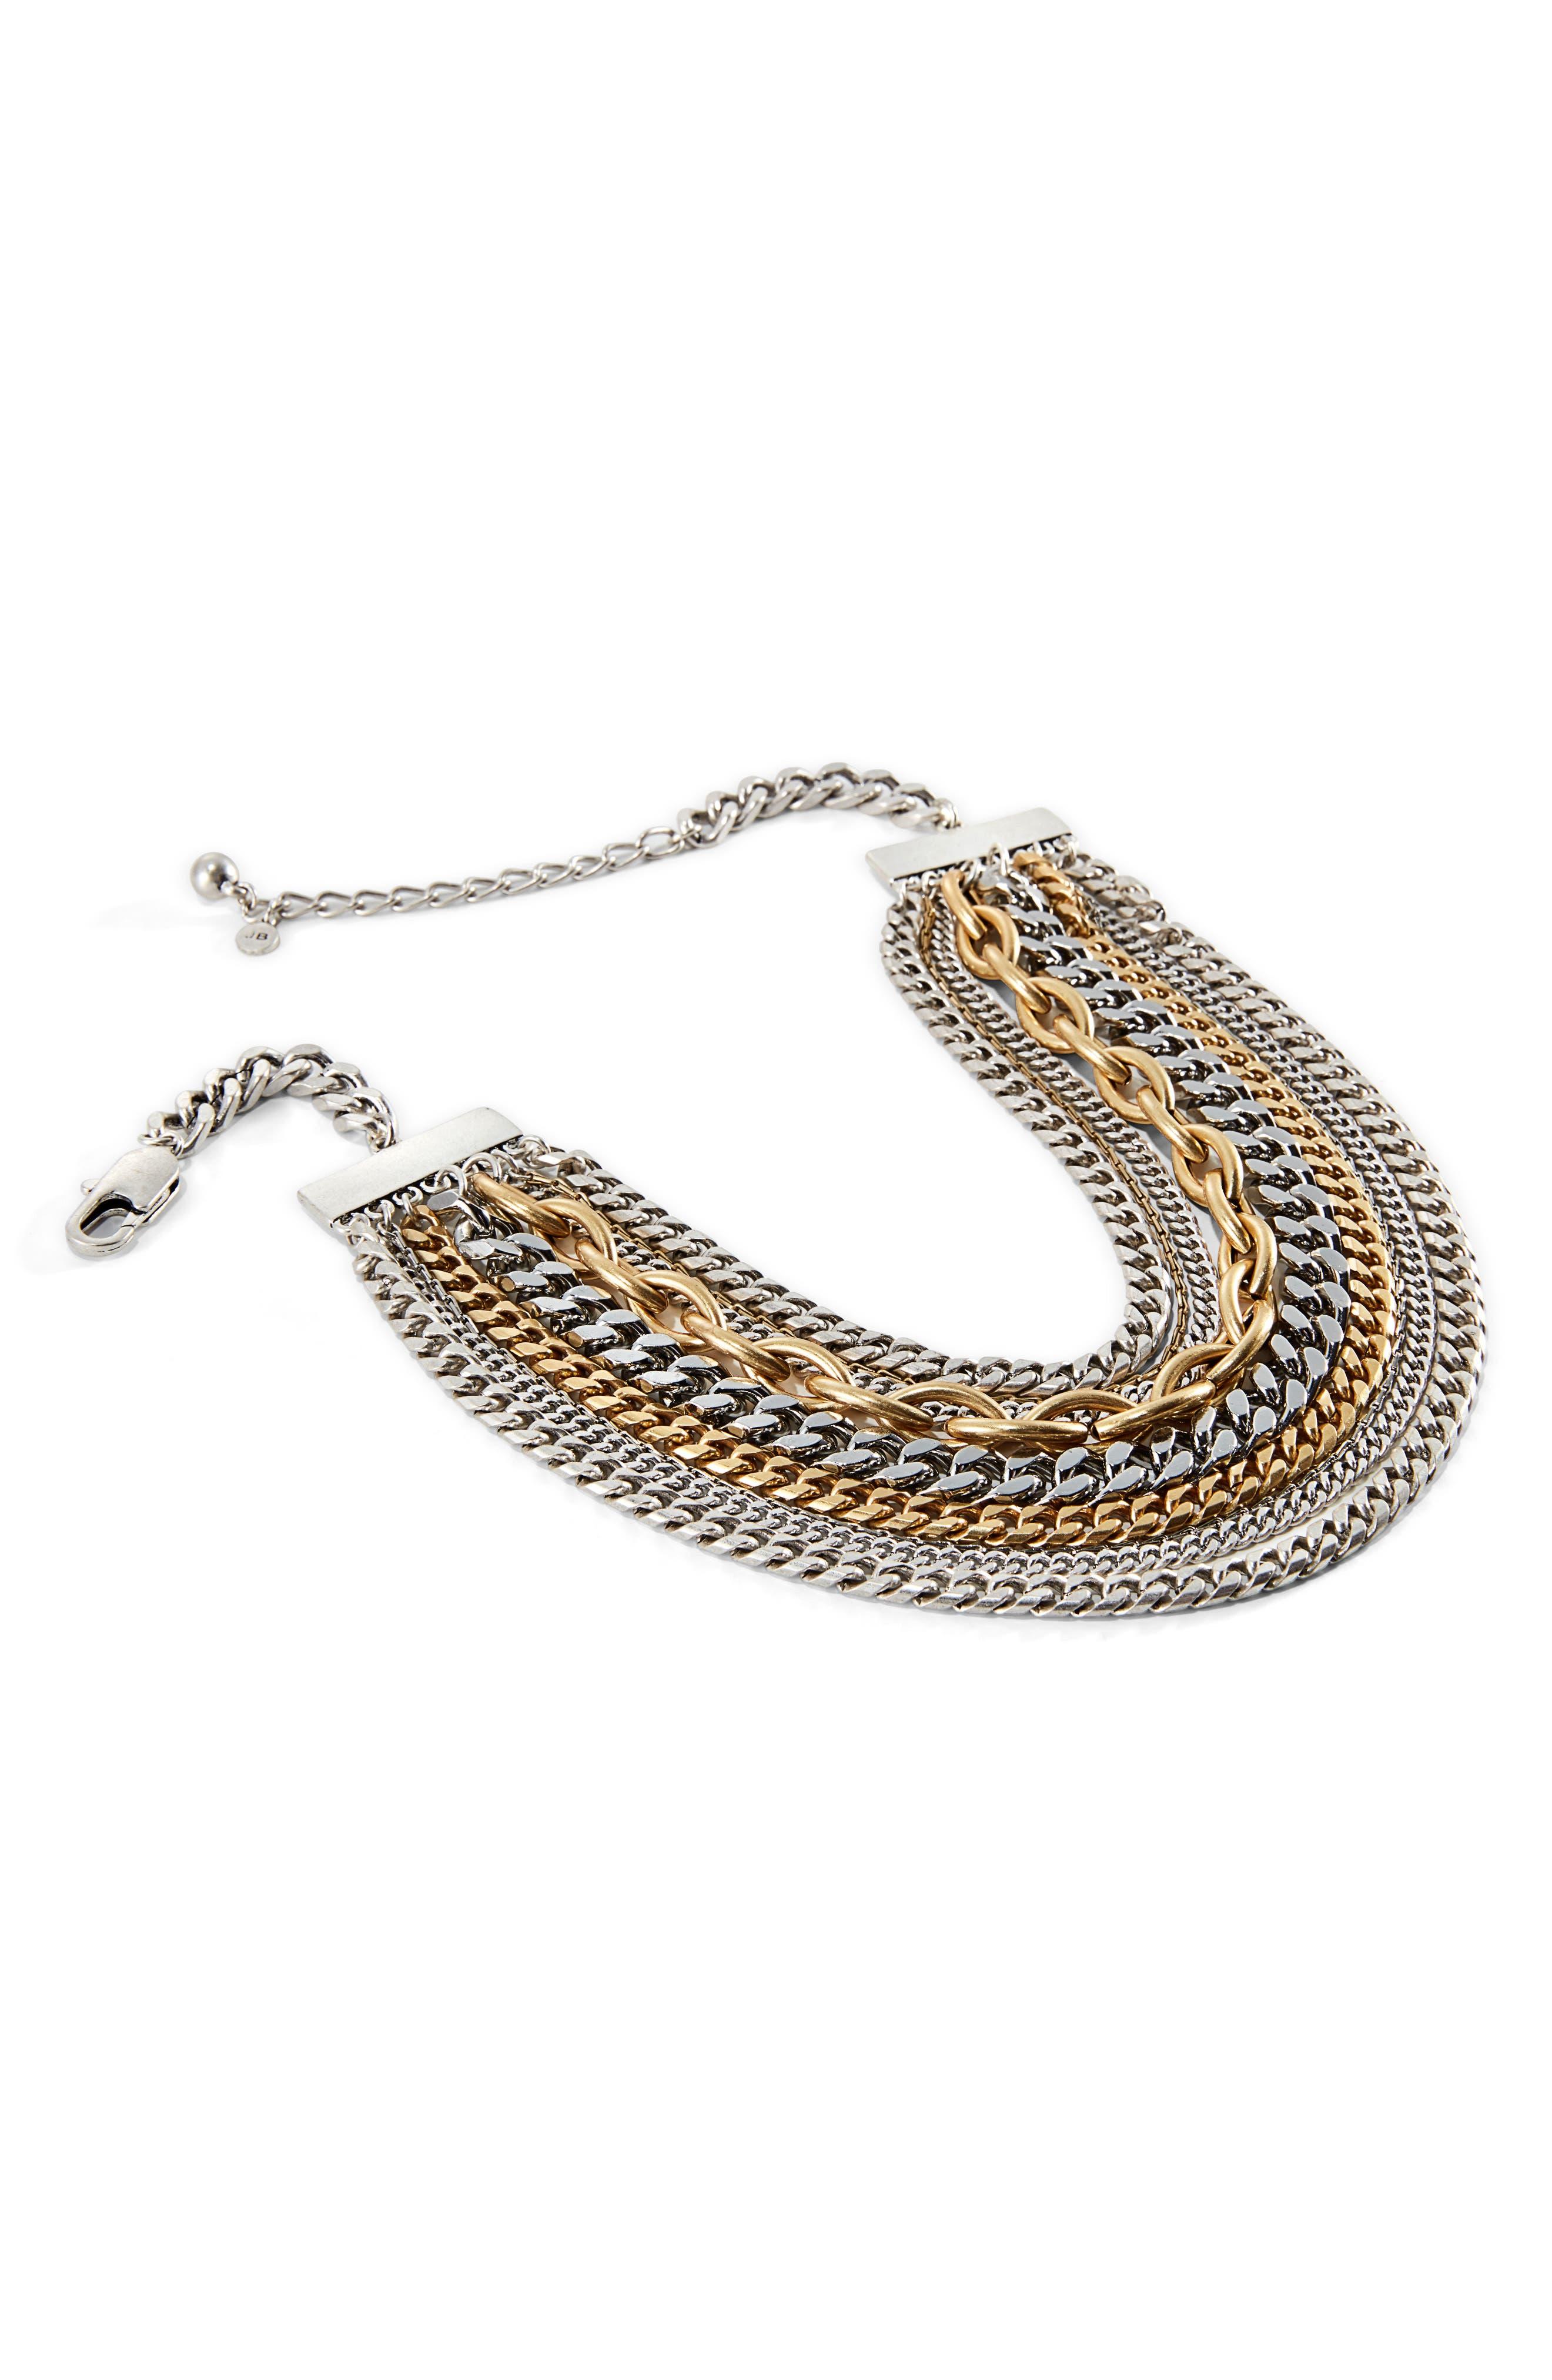 Alternate Image 1 Selected - Jenny Bird Marra Collar Necklace